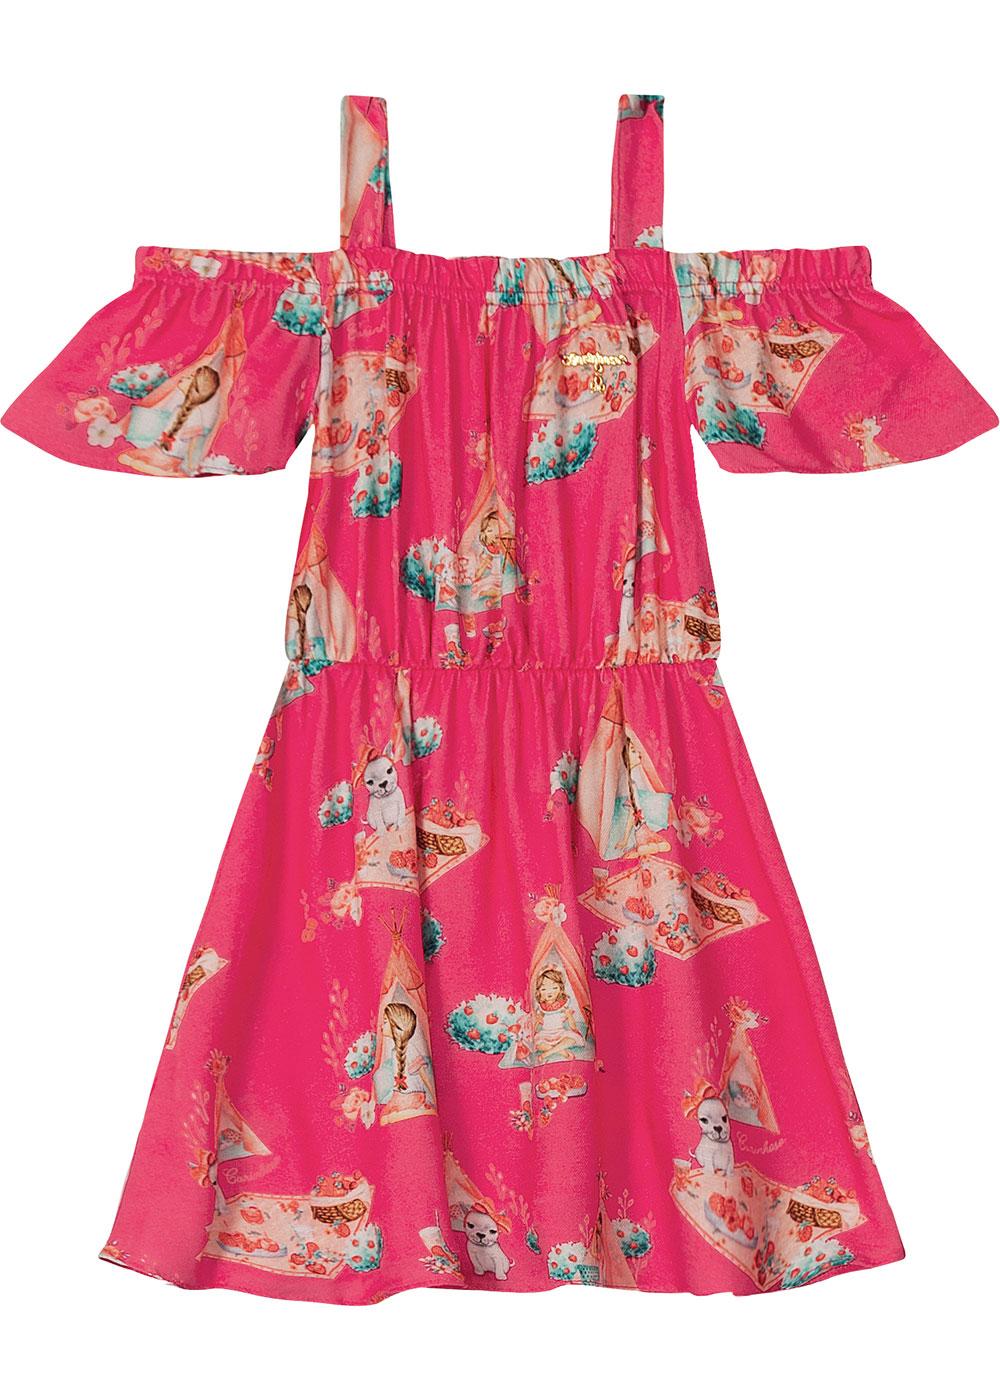 Vestido Infantil Curto Rosa Piquinique - Carinhoso